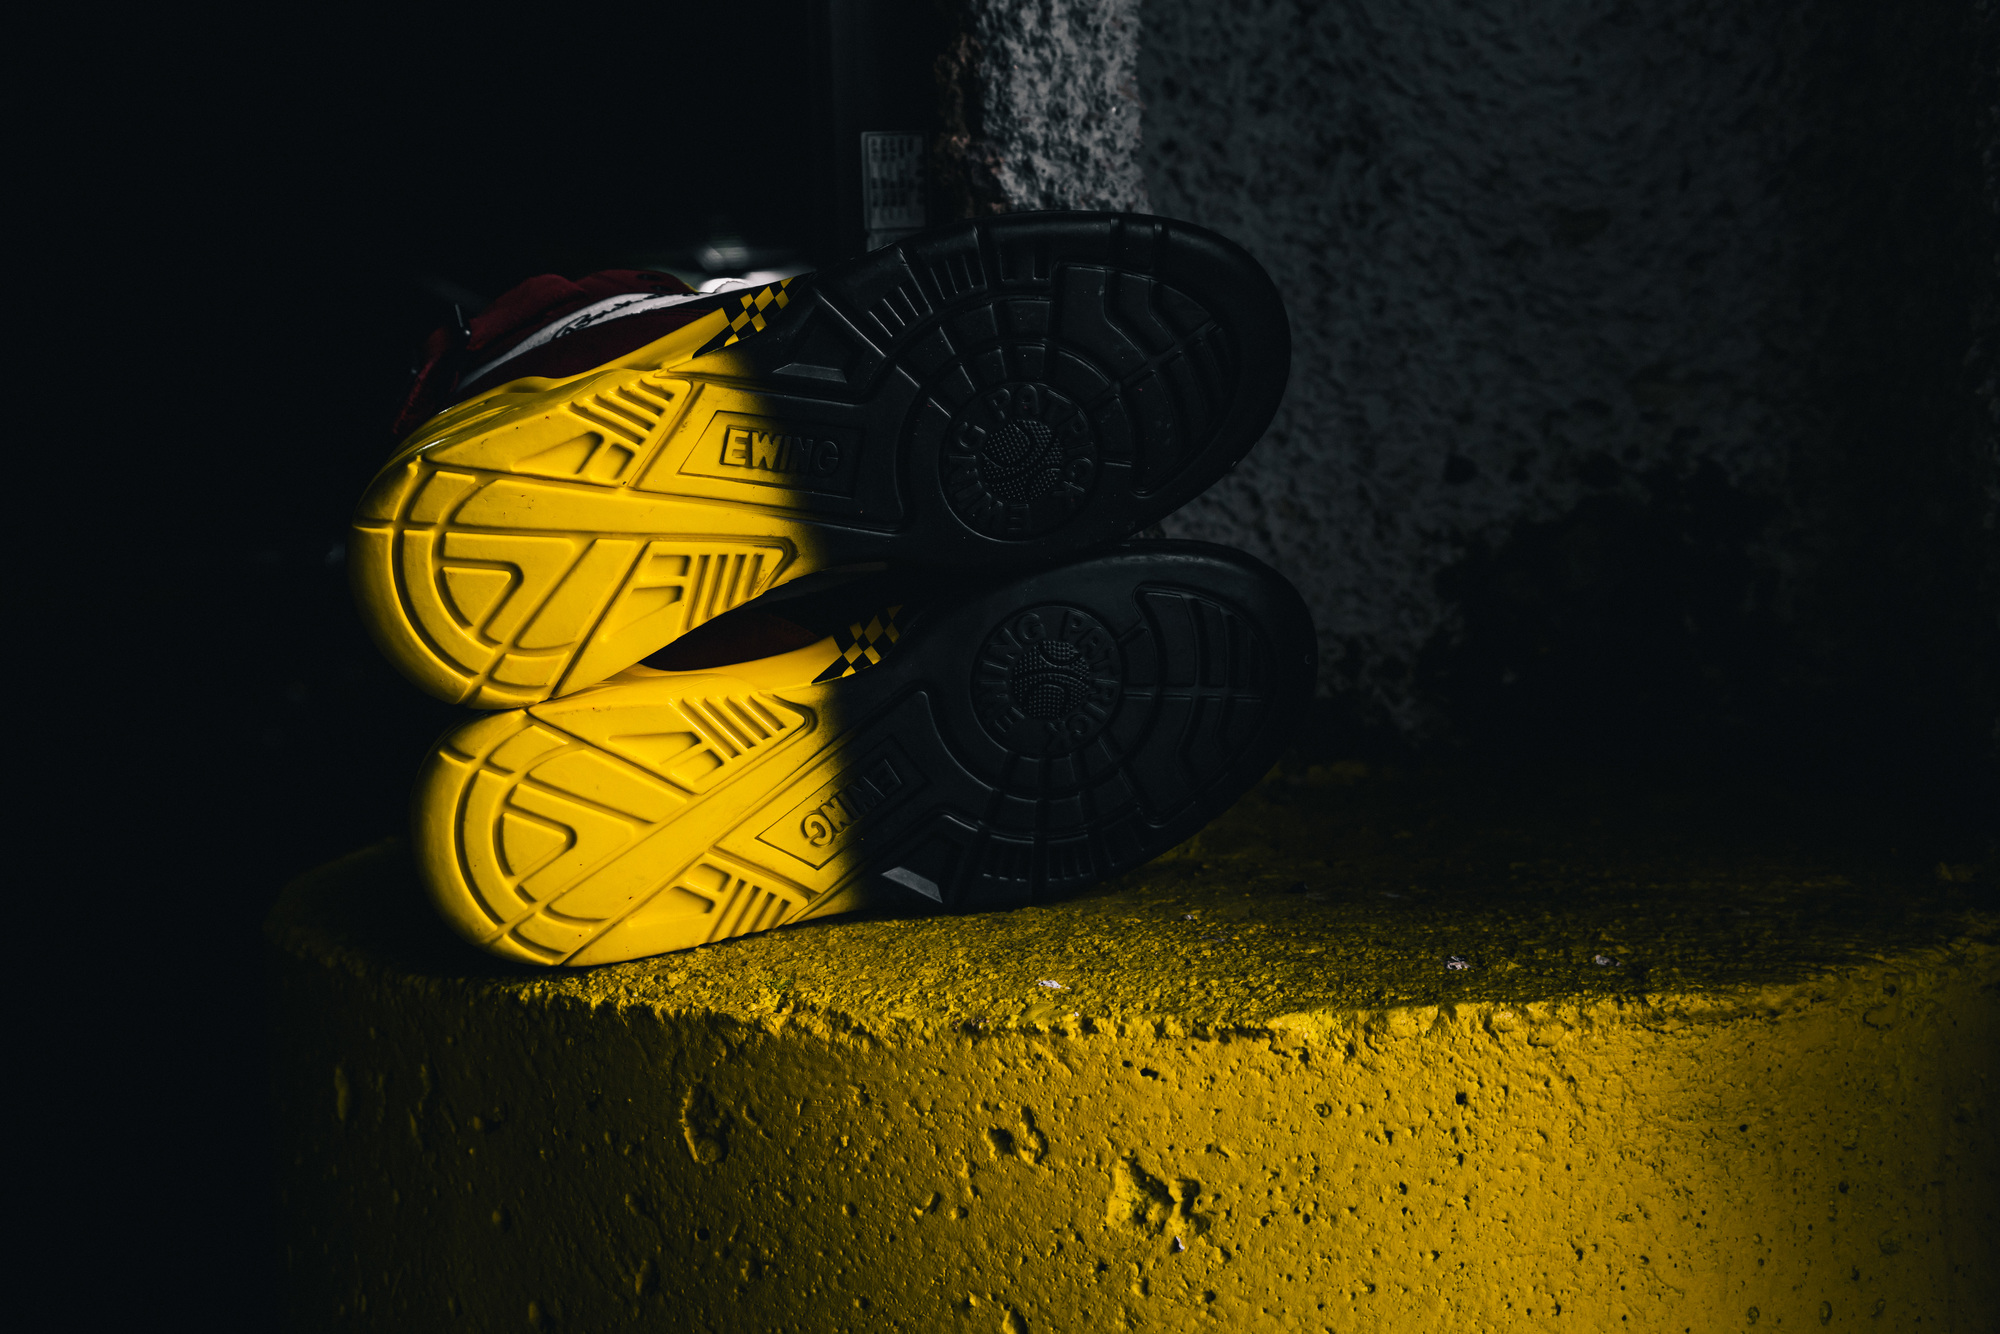 snoop the wire sneaker ewing 33 hi 4